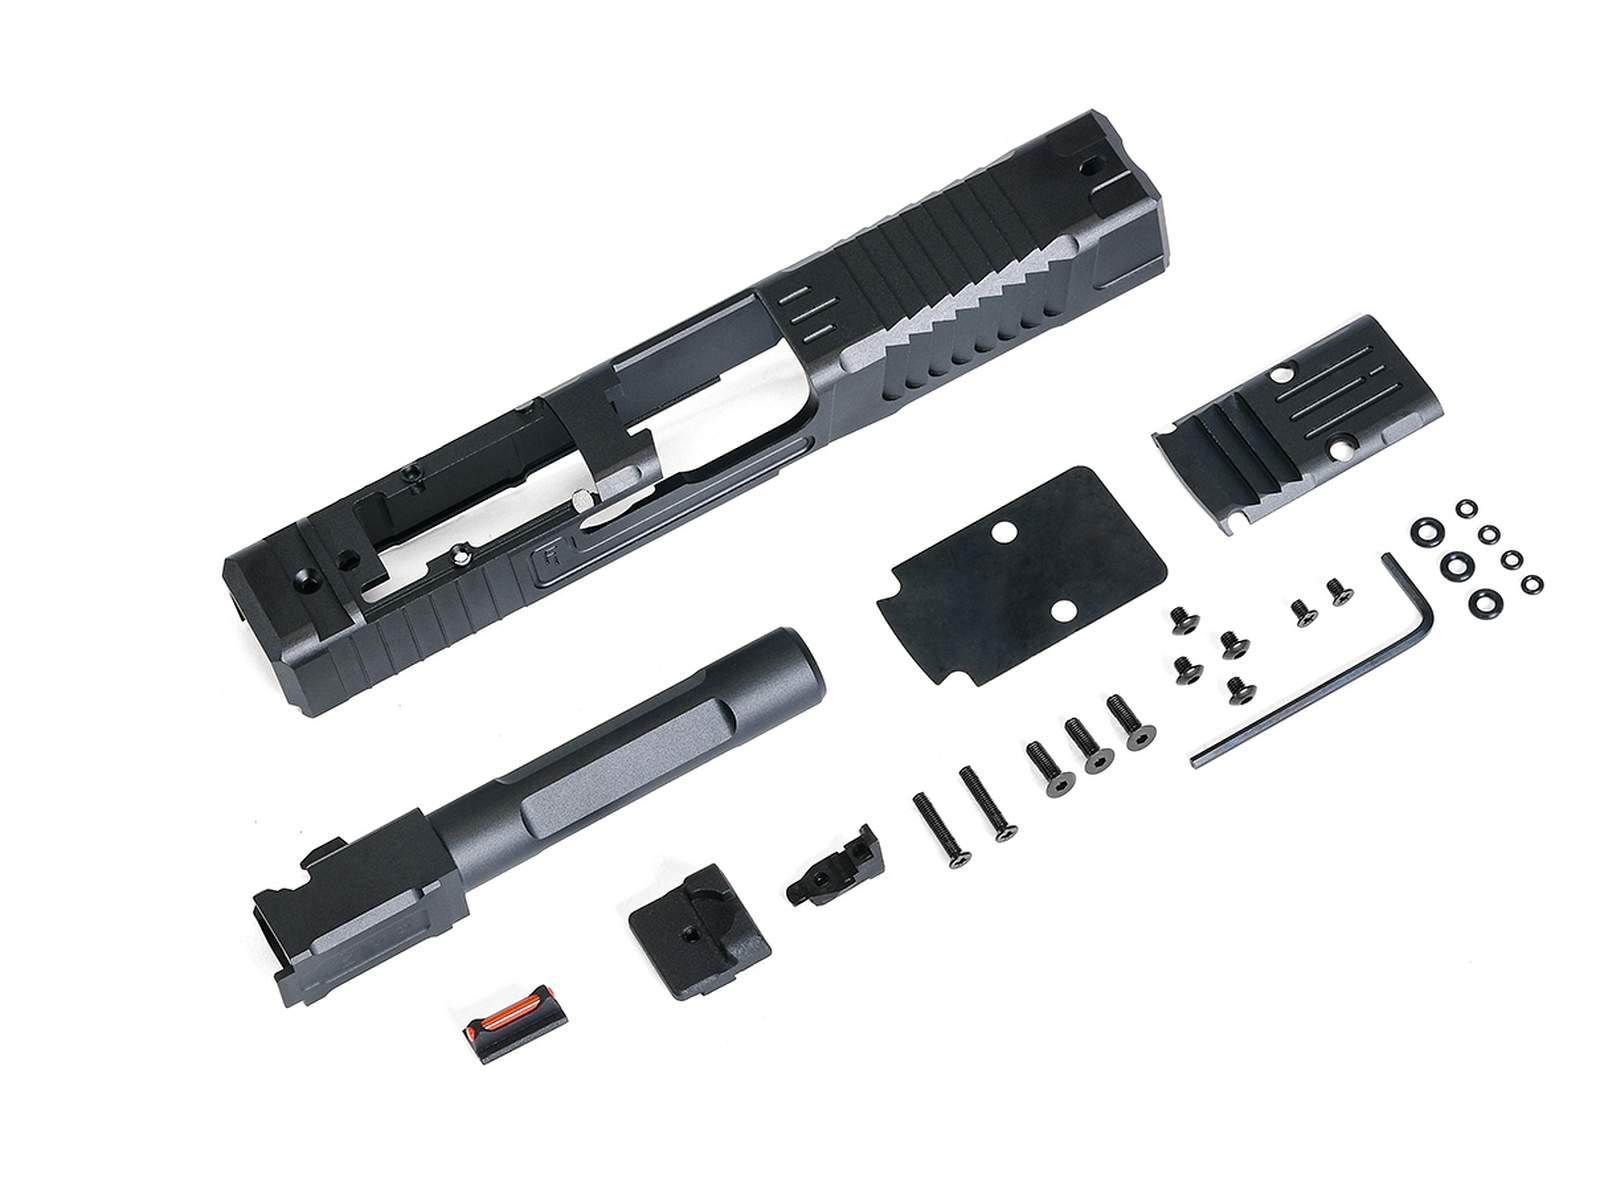 X-Craft FI G19 MK1 CNCスライド/アウターバレルセット (VFC/Umarex G19シリーズ用)